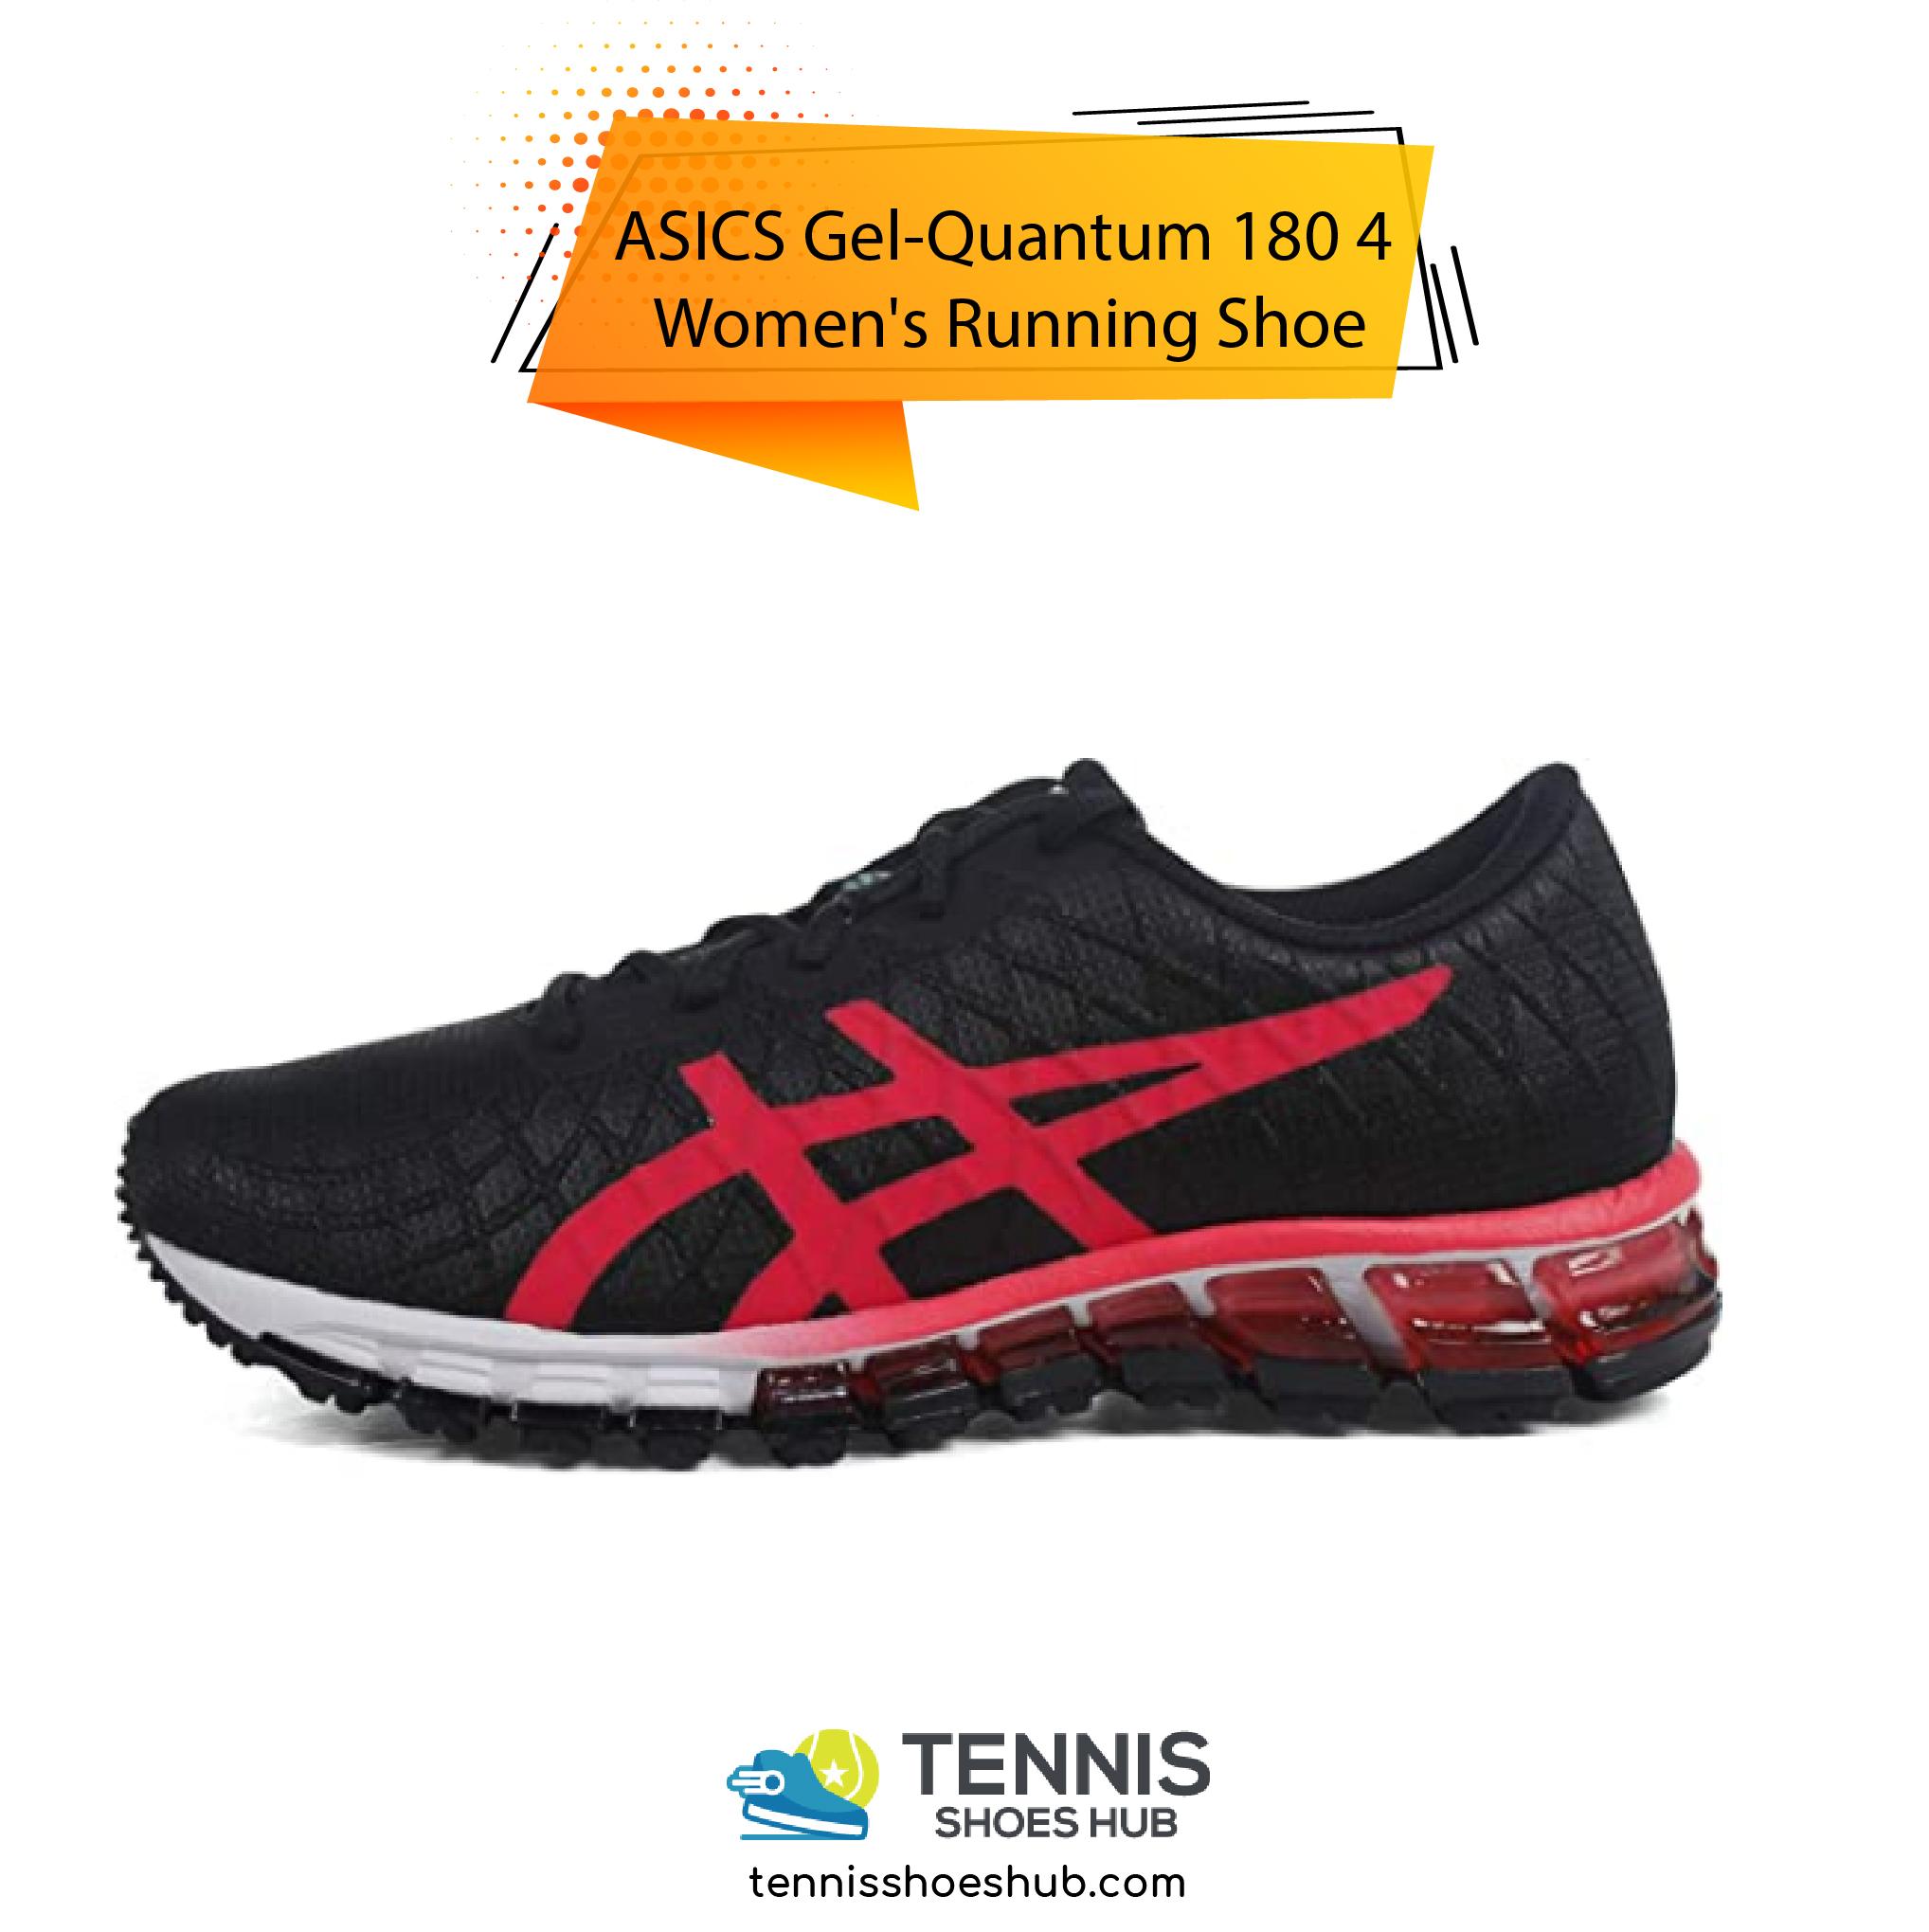 ASICS Gel Quantum 180 4 Womens Running Shoe 01